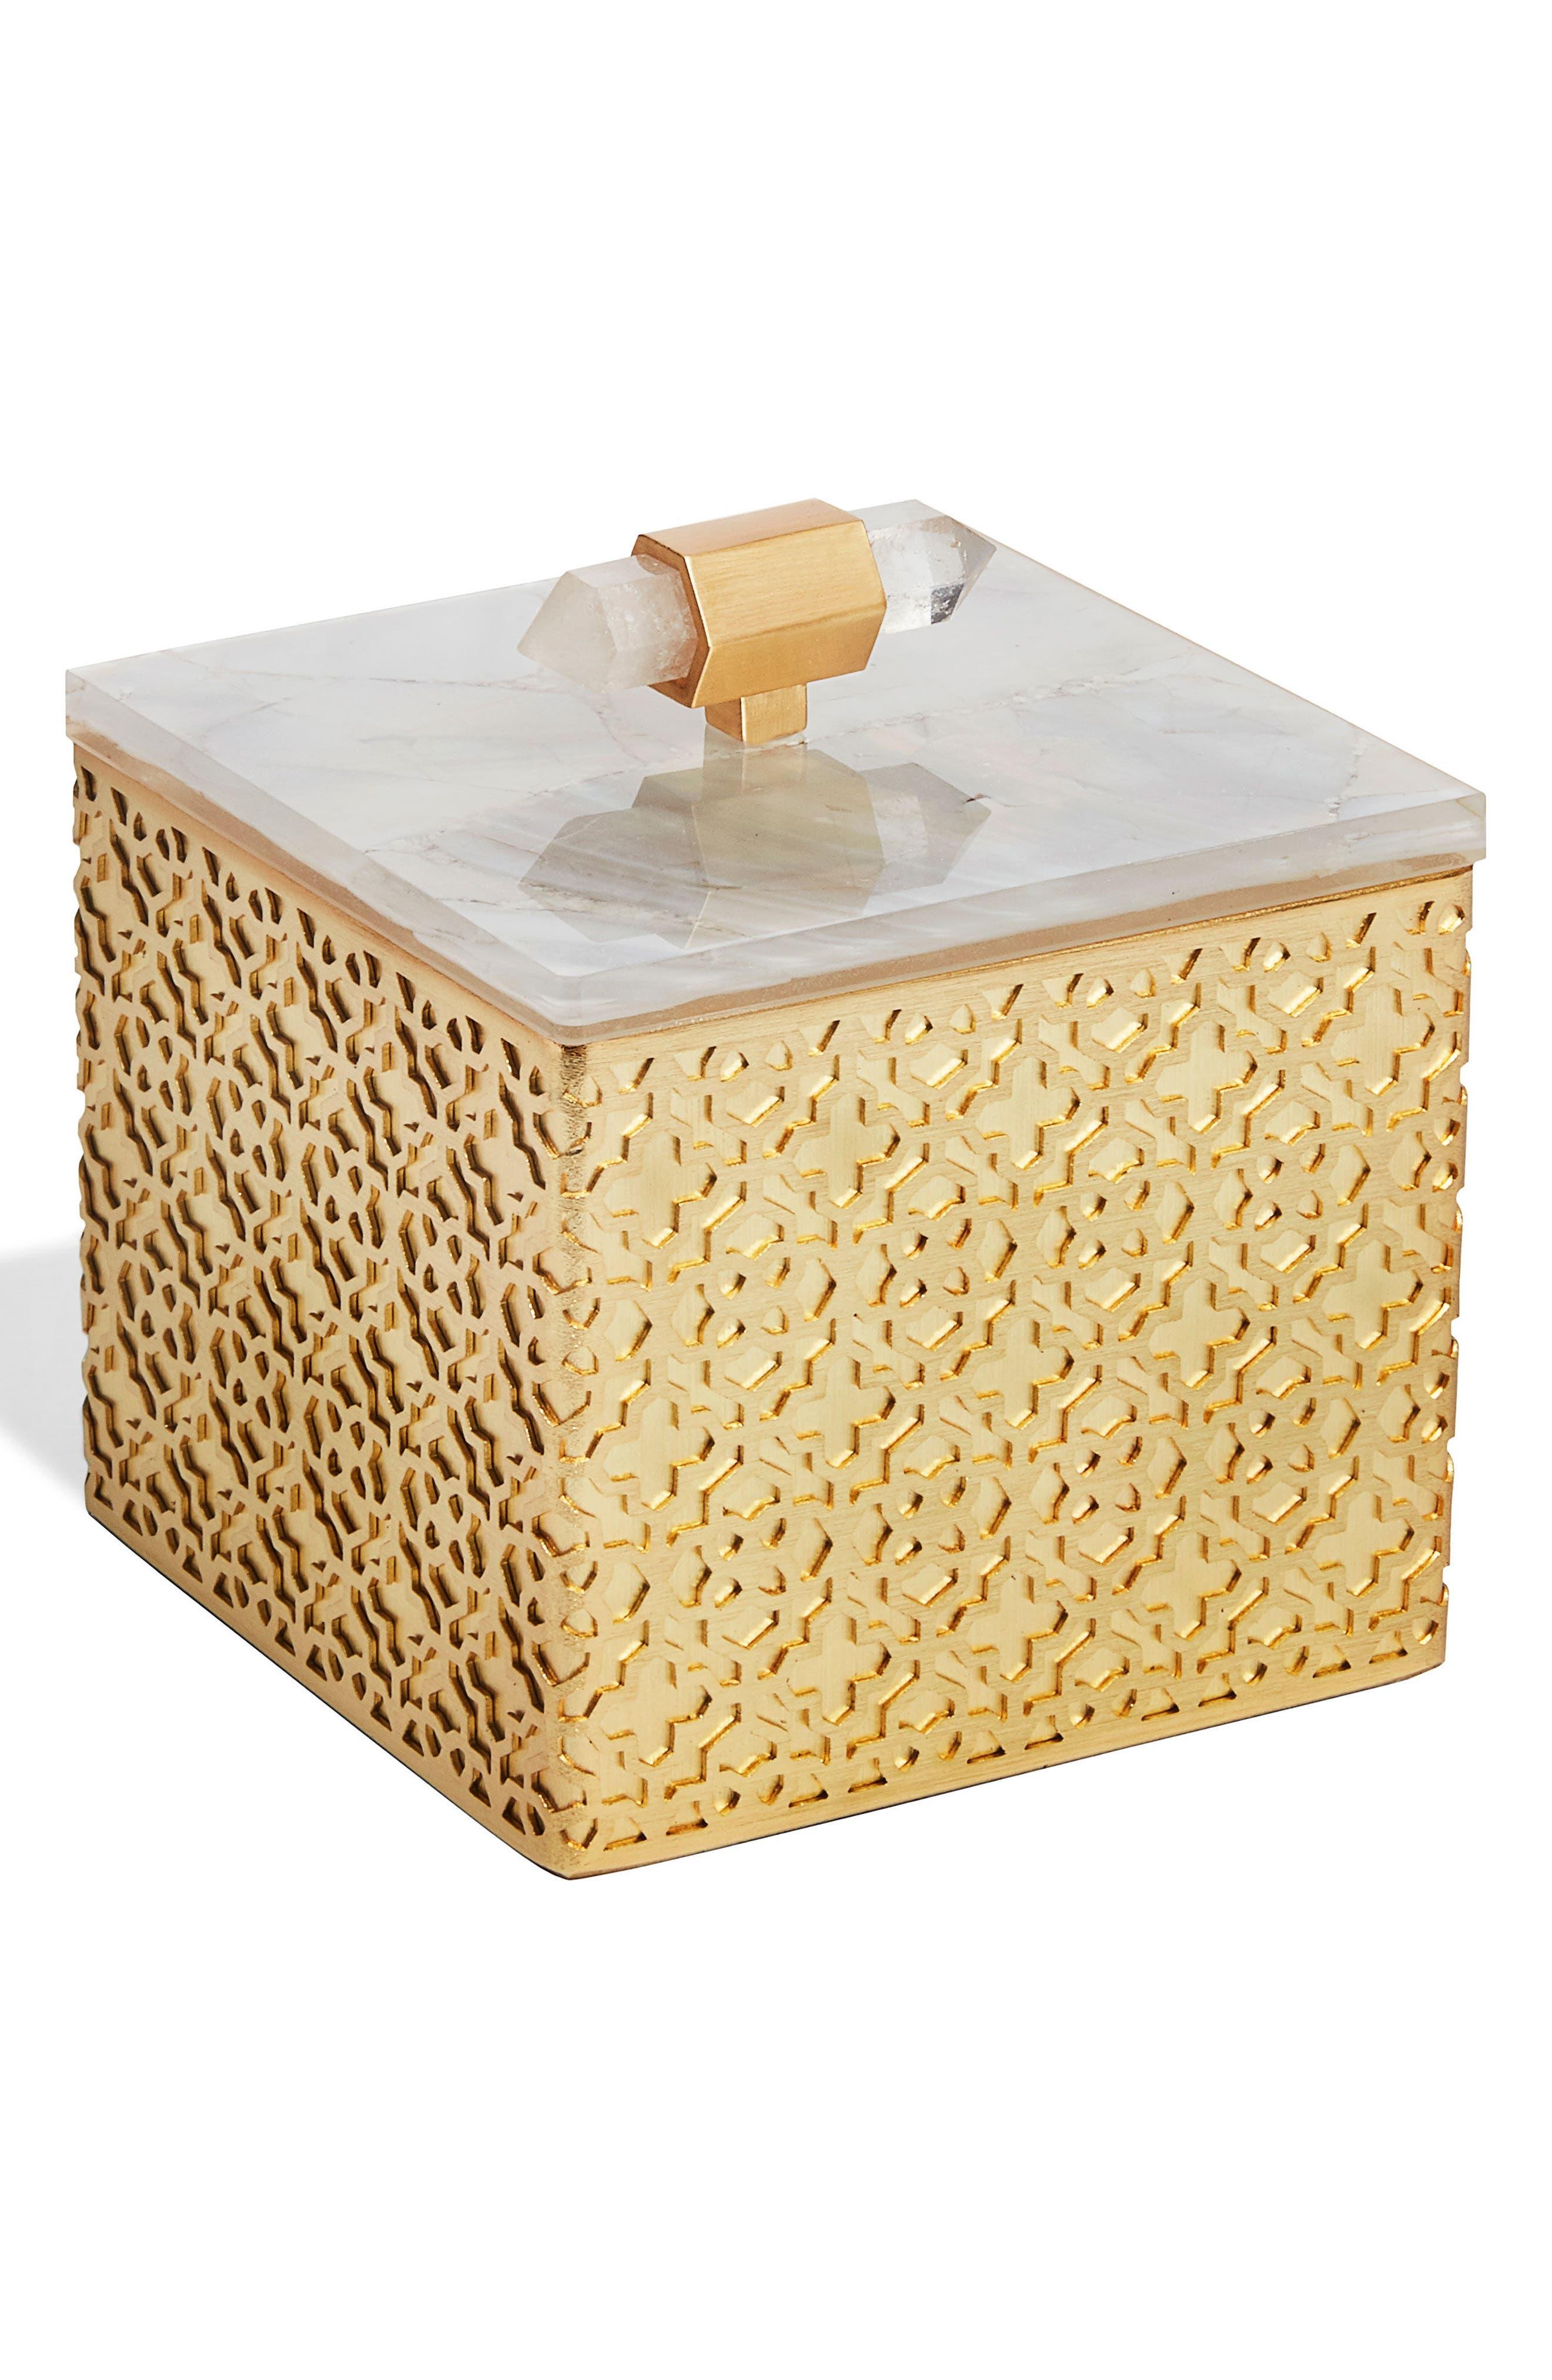 Kendra Scott Square Filigree Stone Box